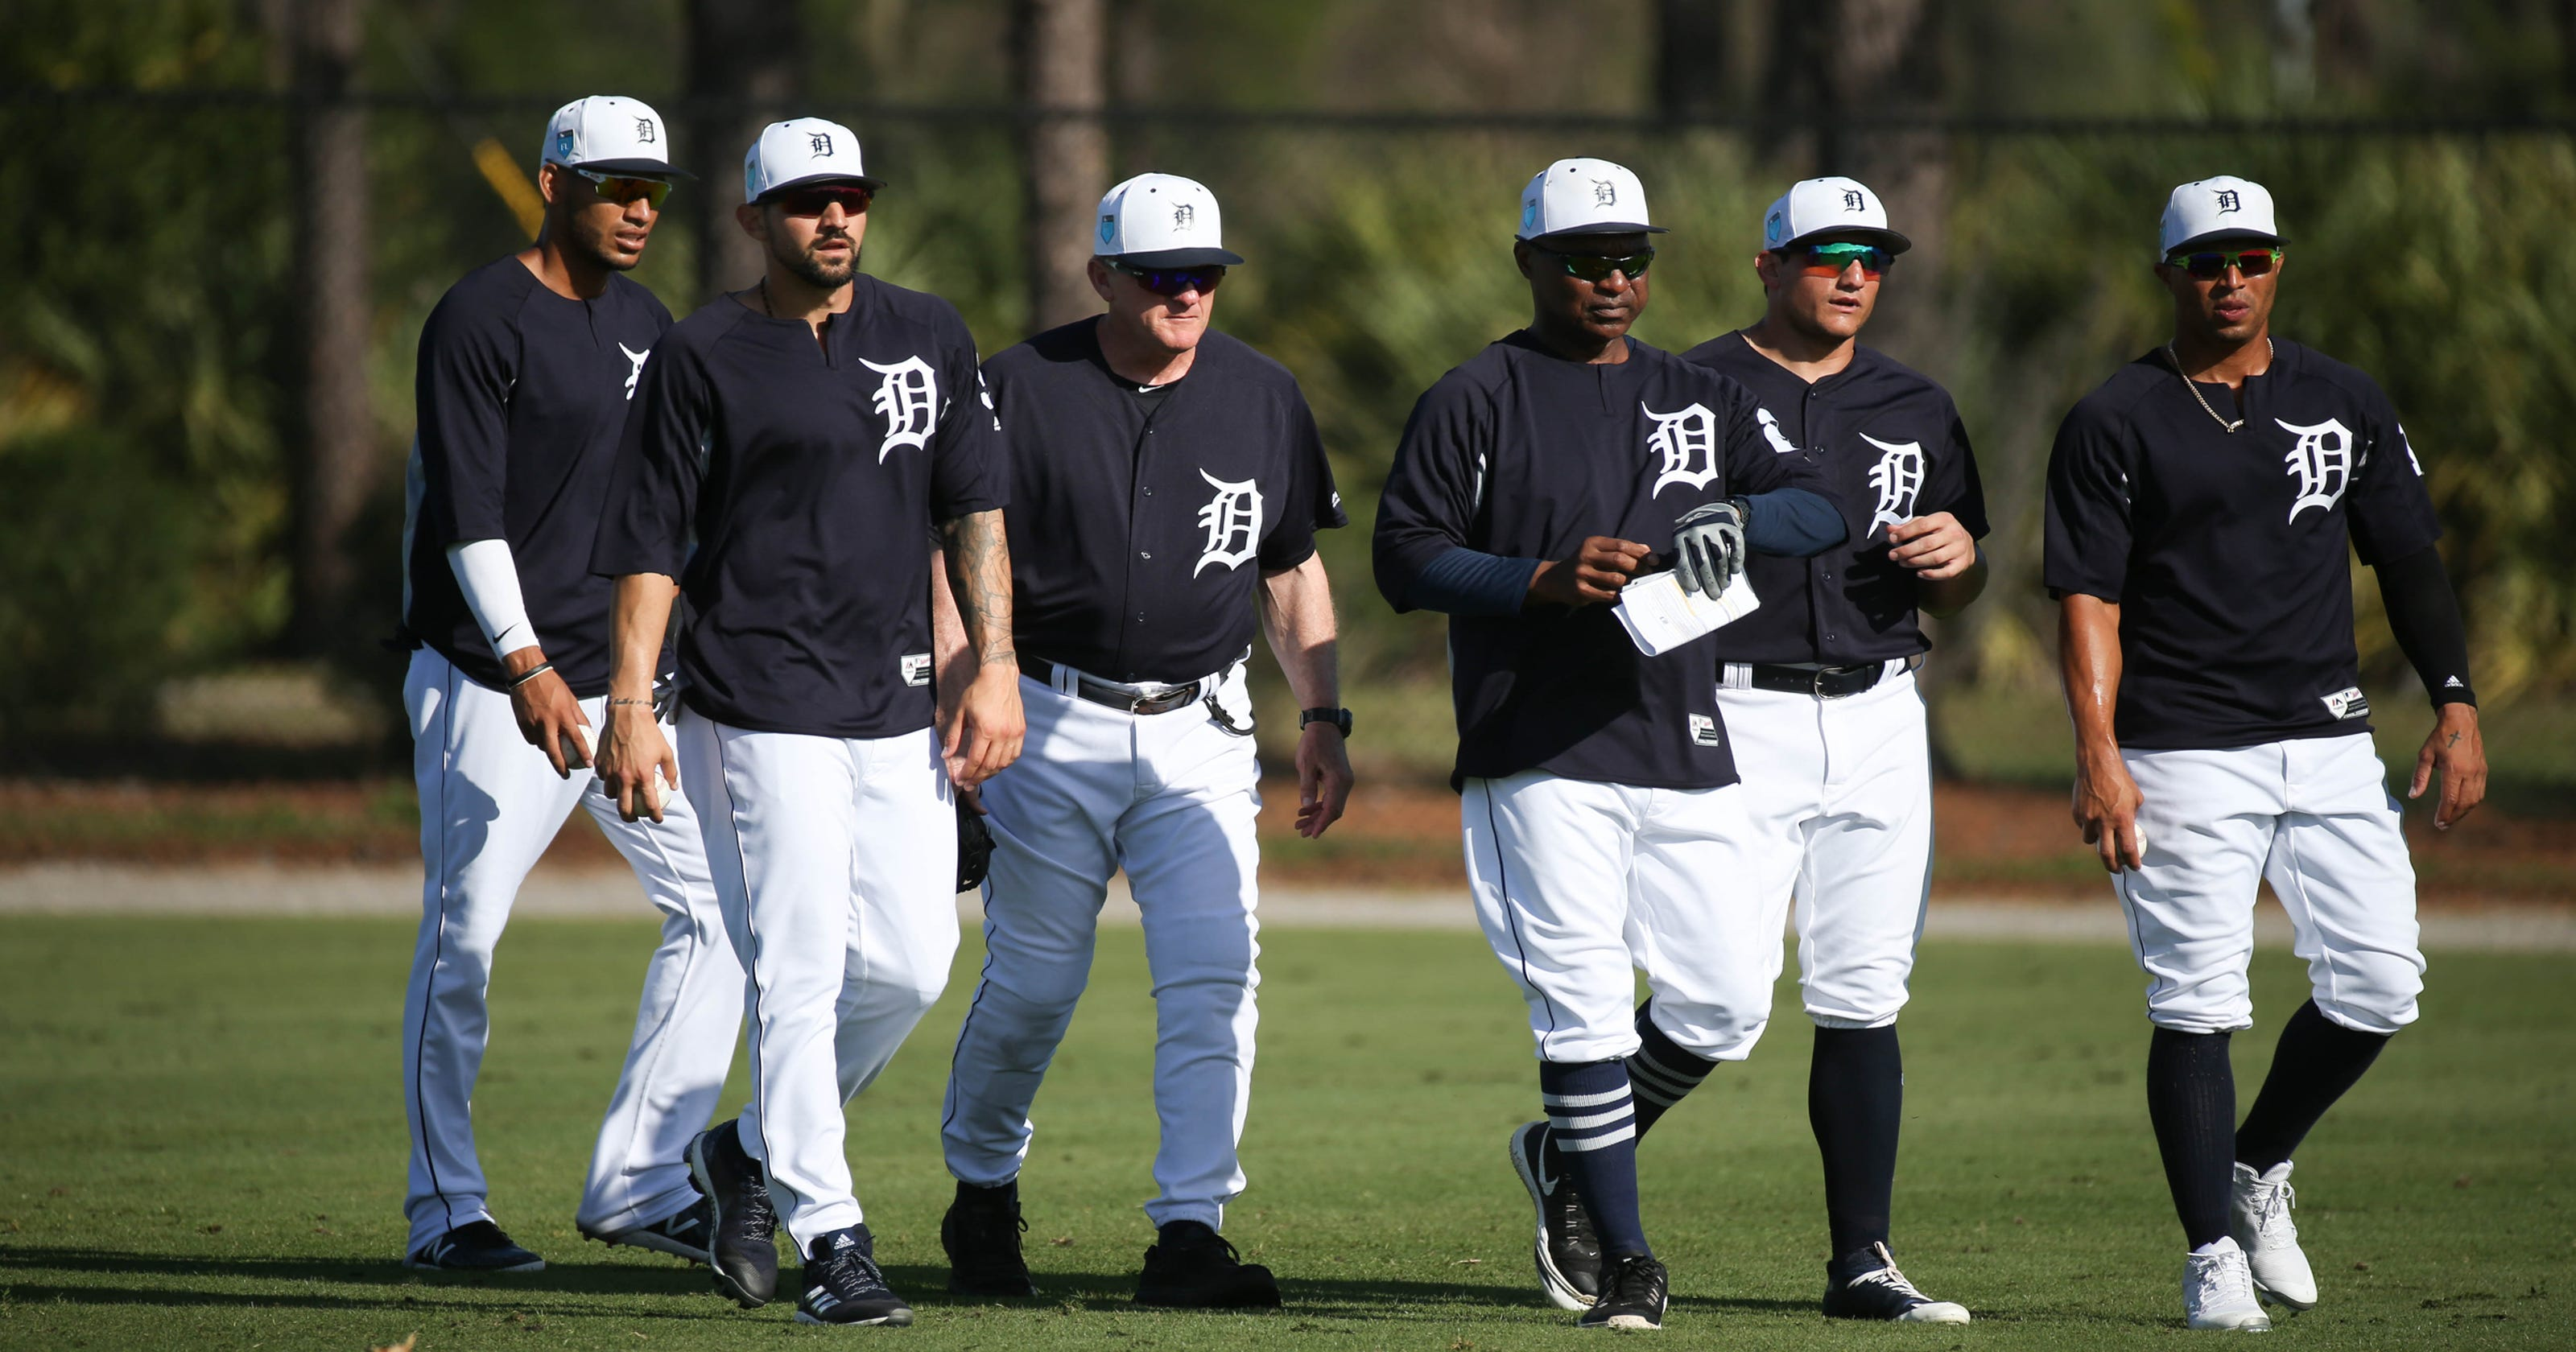 Detroit Tigers vs  Florida Southern Mocs today: Time, TV, radio info